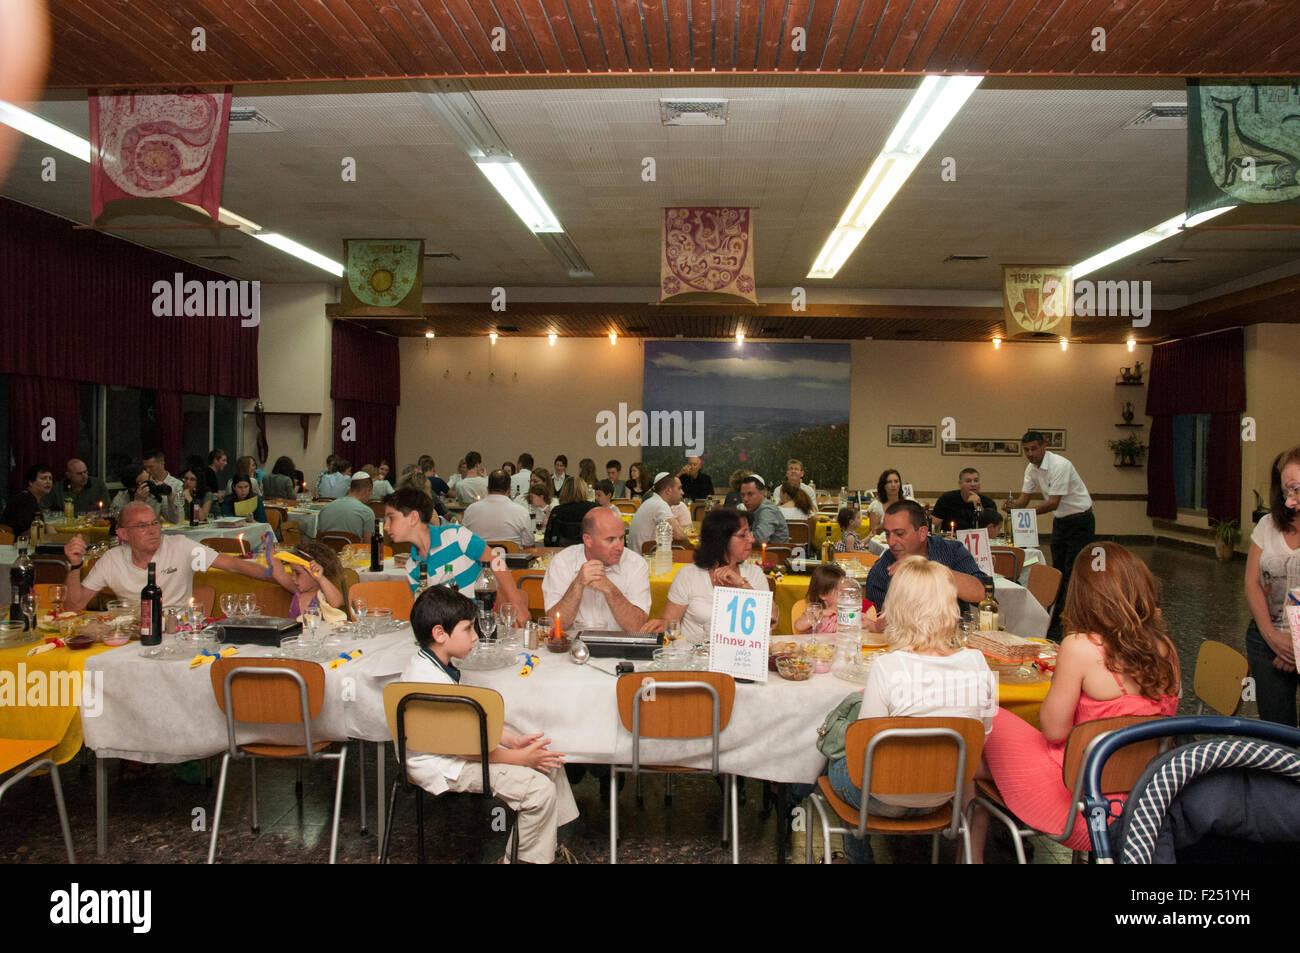 Passover Seder at Kibbutz Ashdot Yaacov, Israel - Stock Image